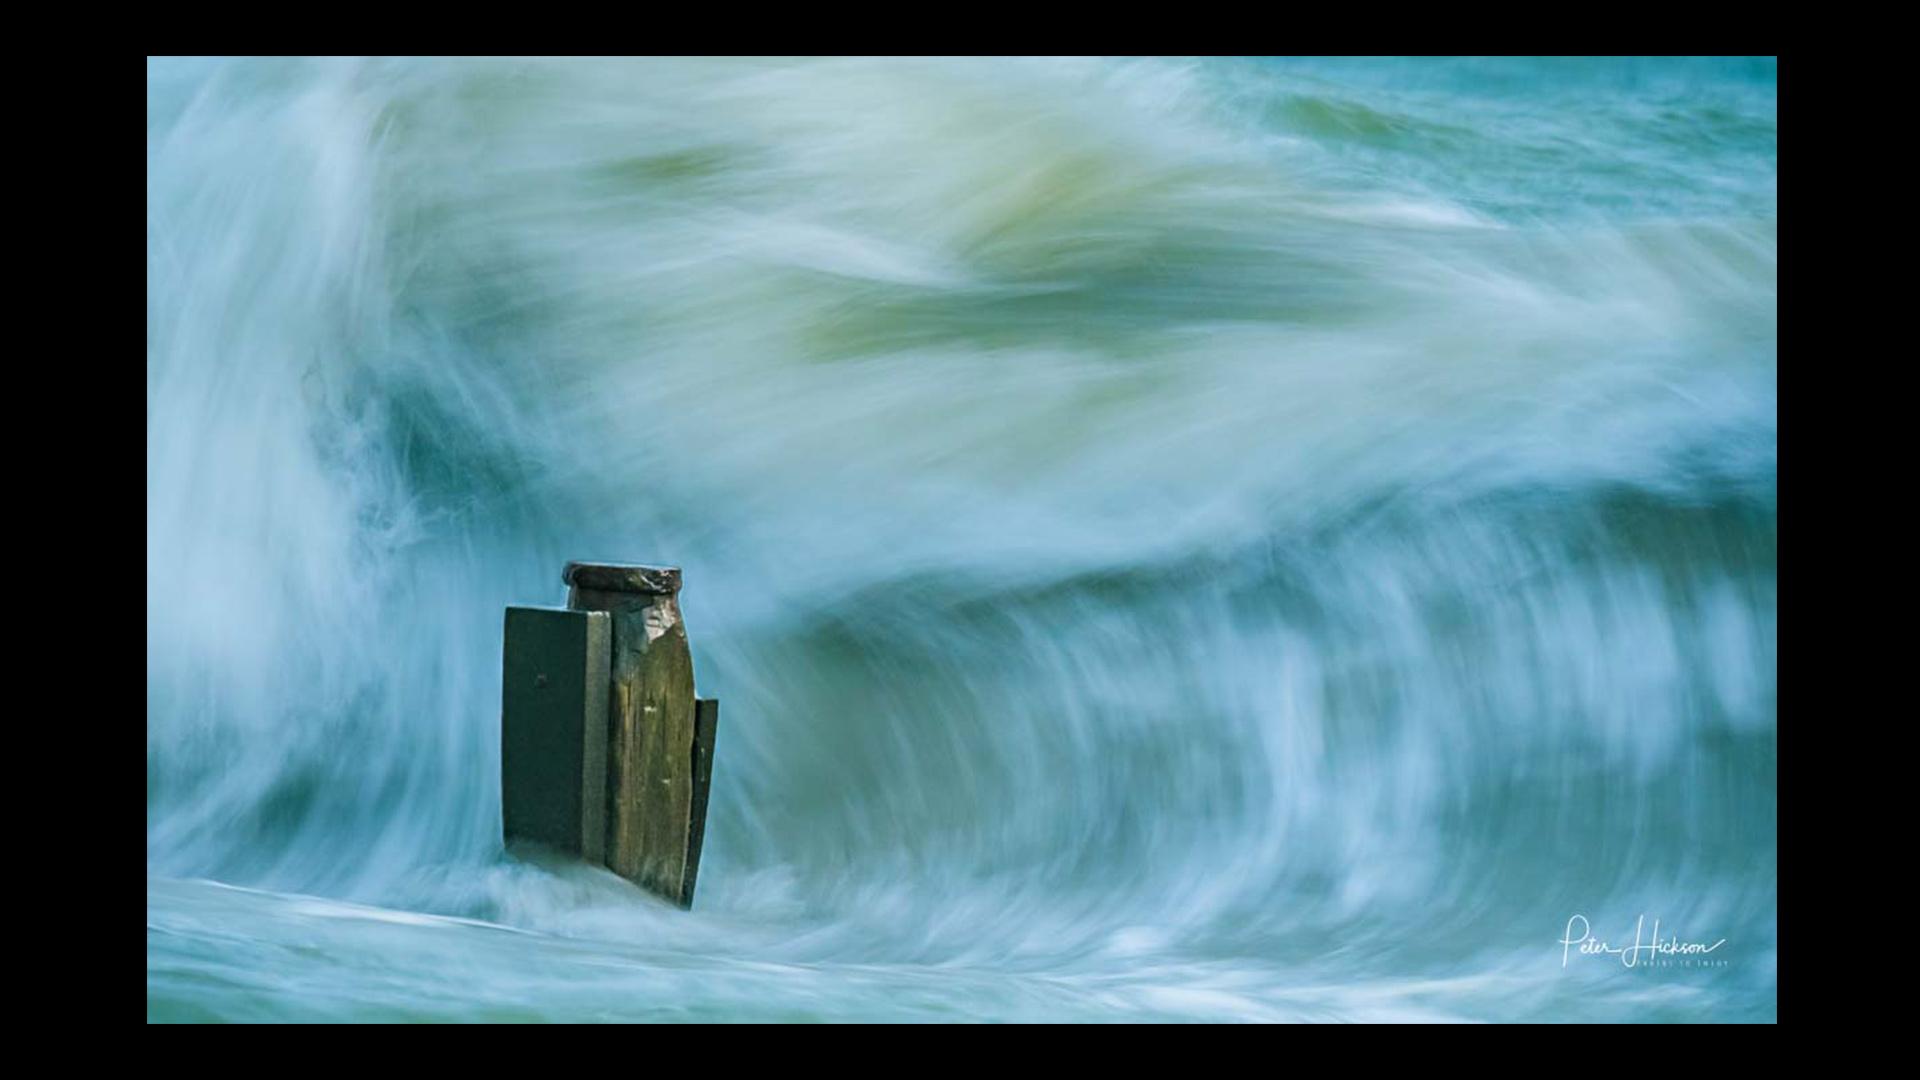 Outdoor   Photographer: Peter HicksonCurator: Rob Sylvan